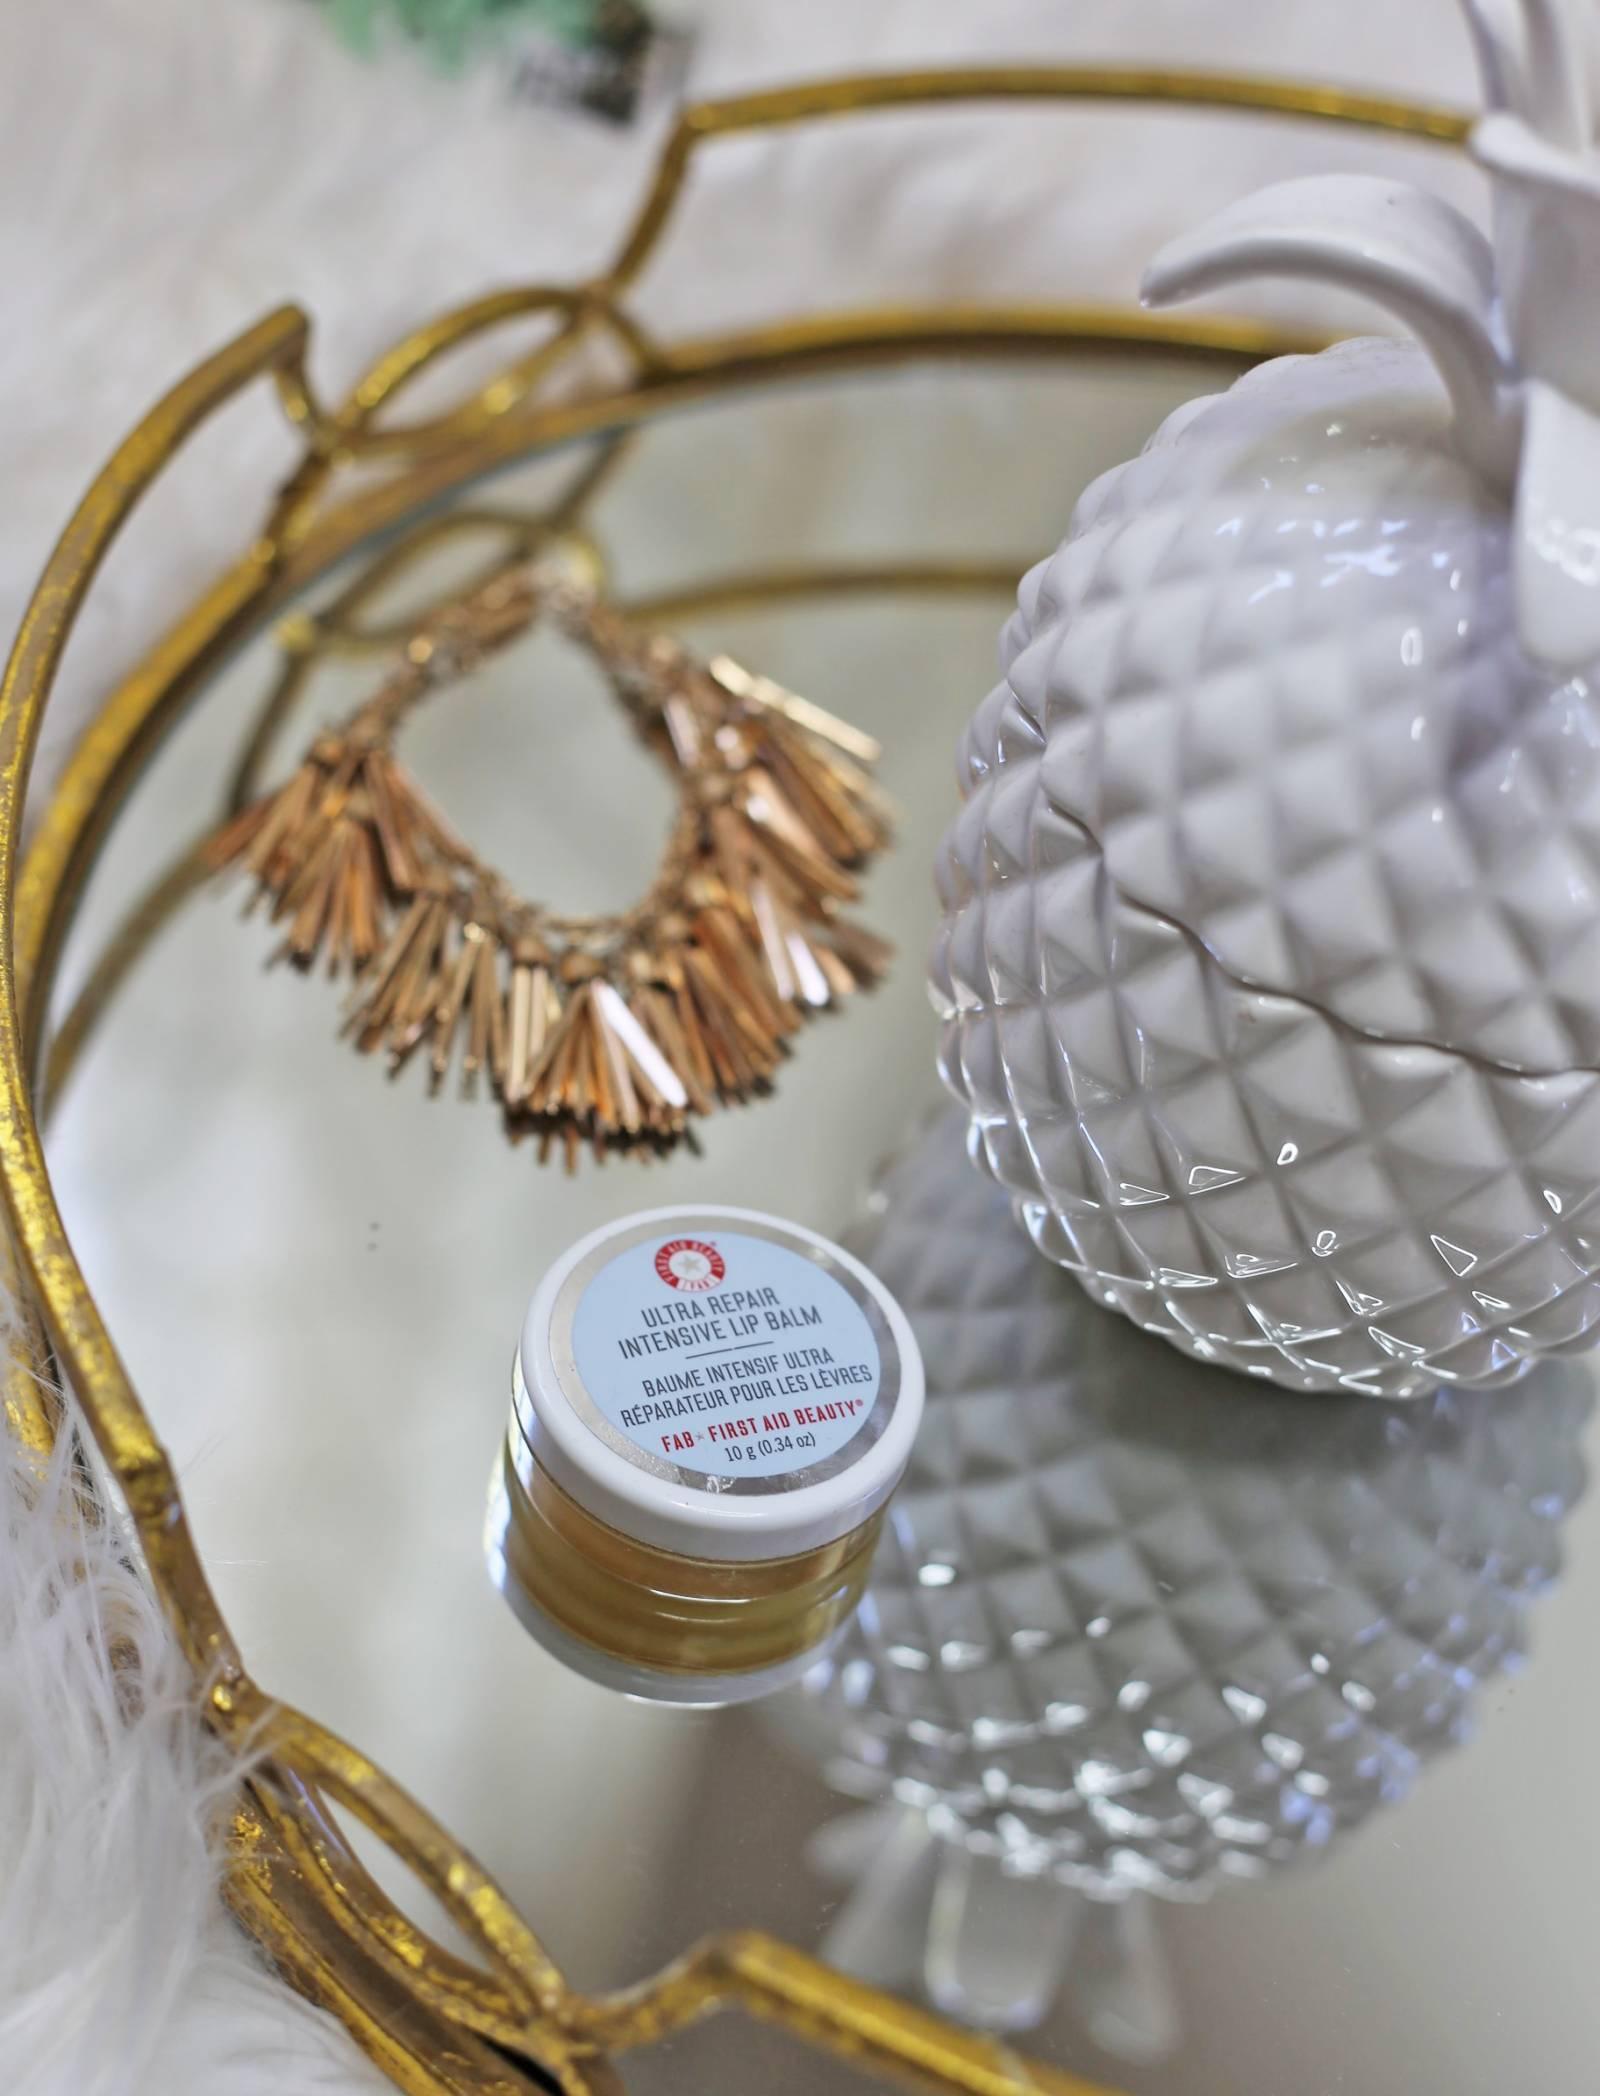 best lip balm from ulta   best beauty finds from ulta    spring beauty favorites    mash elle beauty blogger   Ulta makeup   naked   hoola   clinique